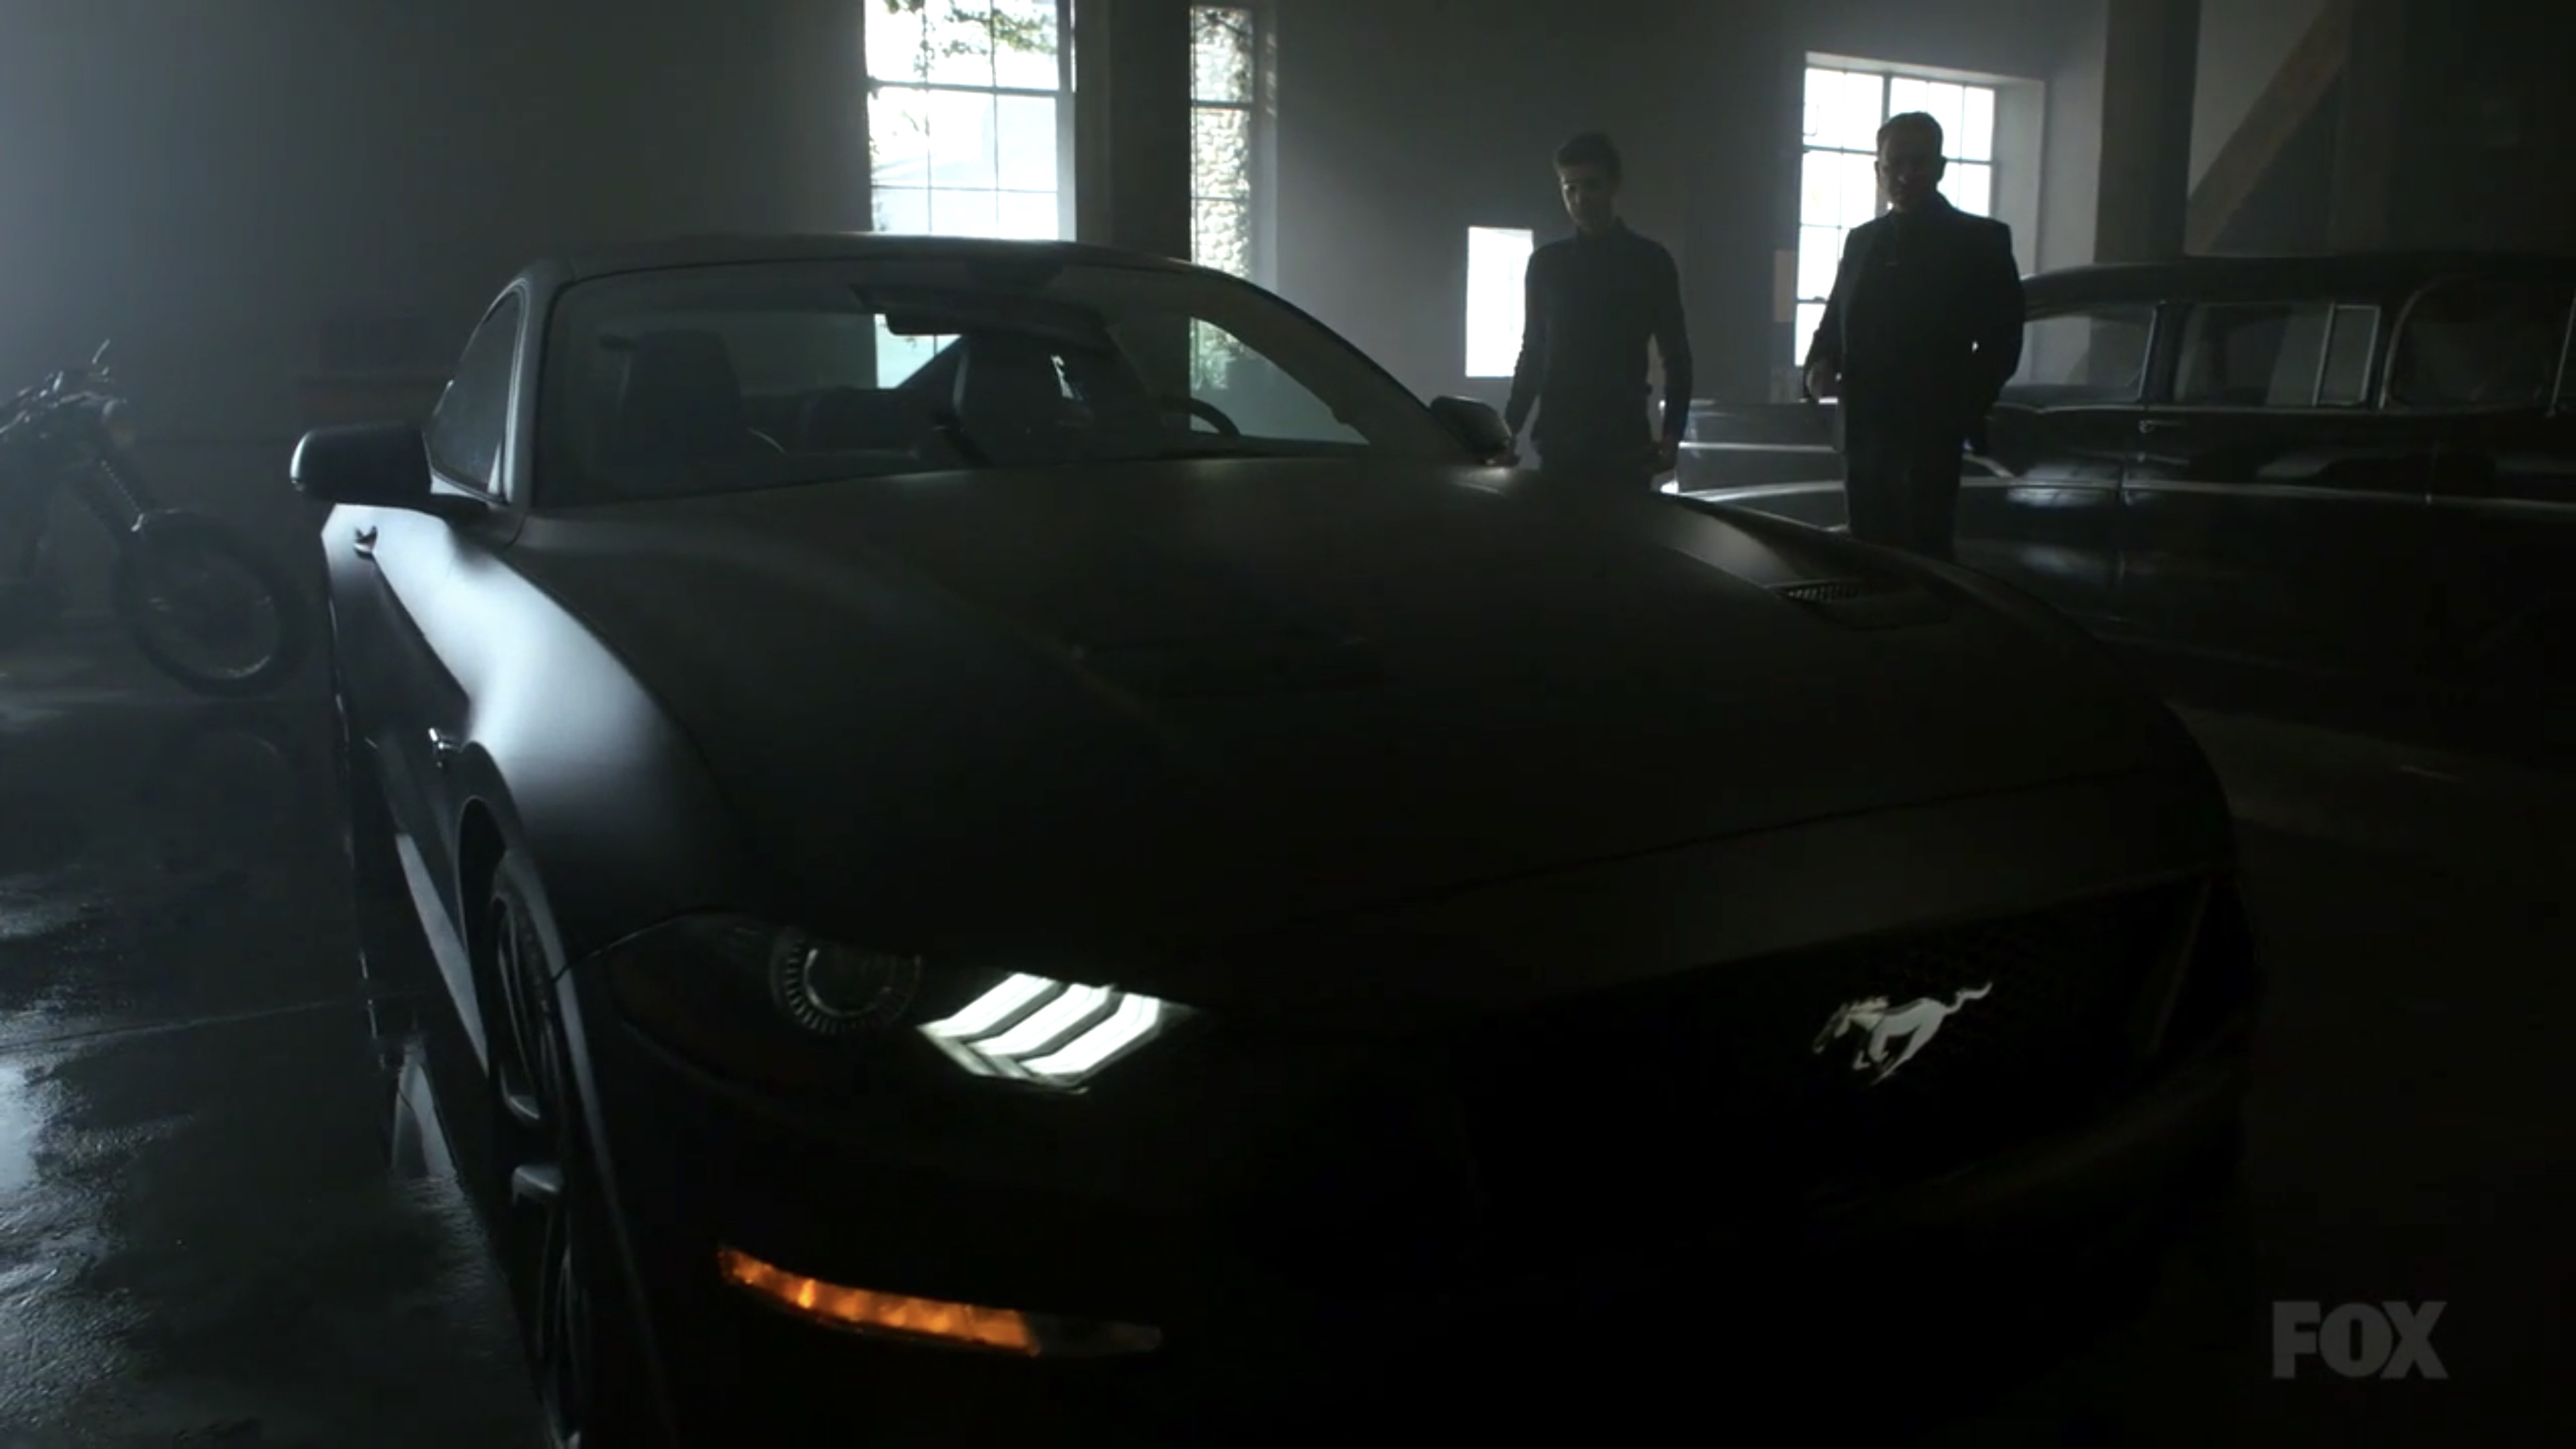 Black 2018 Ford Mustang >> Watch Bruce Wayne receive his first Batmobile on 'Gotham' - Batman News